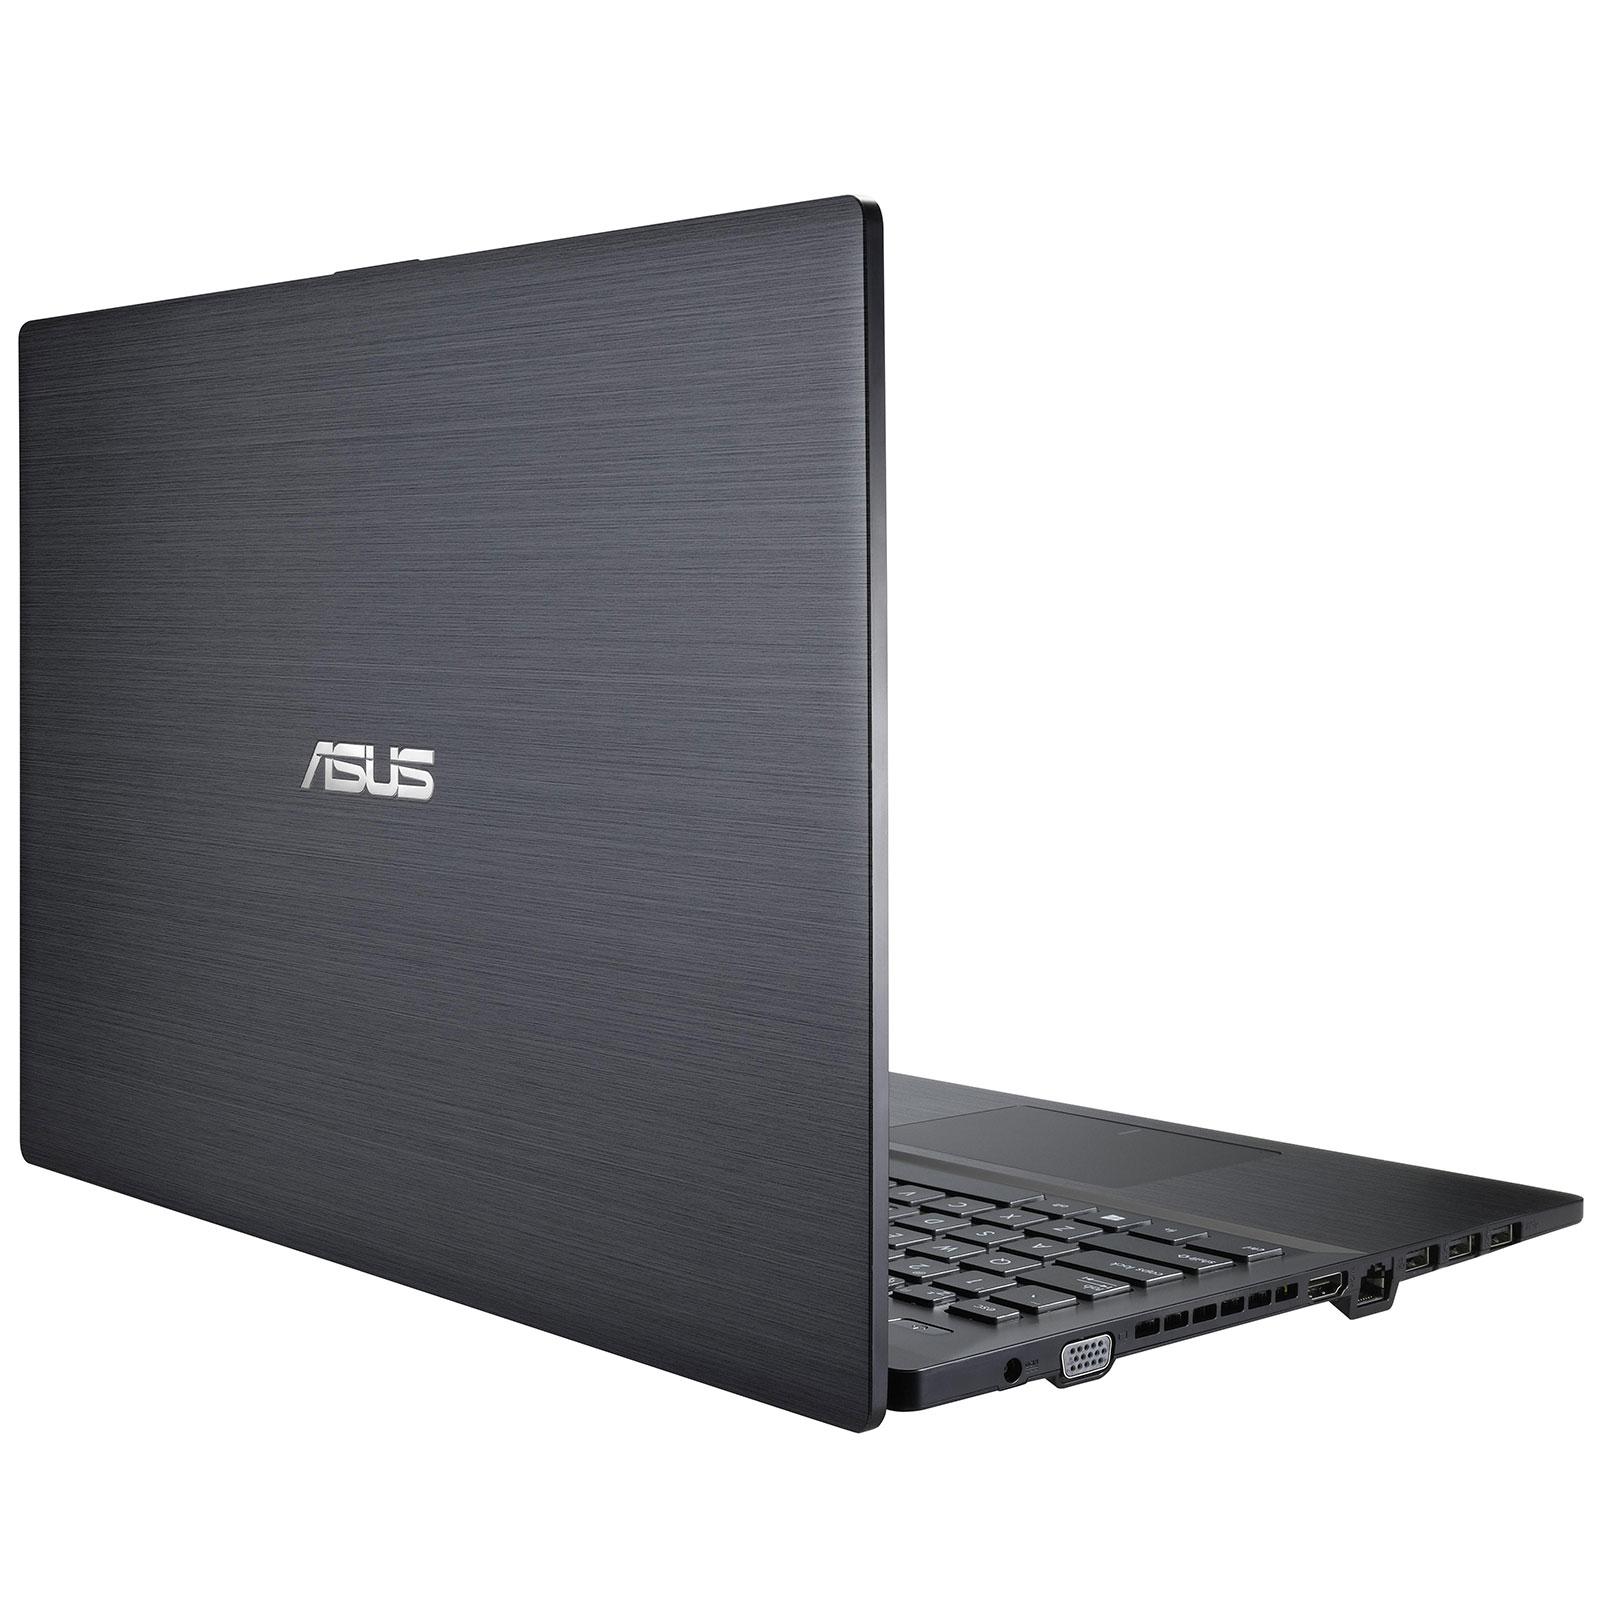 Asus P2530UA-XO0178RB - PC portable Asus - Cybertek.fr - 3